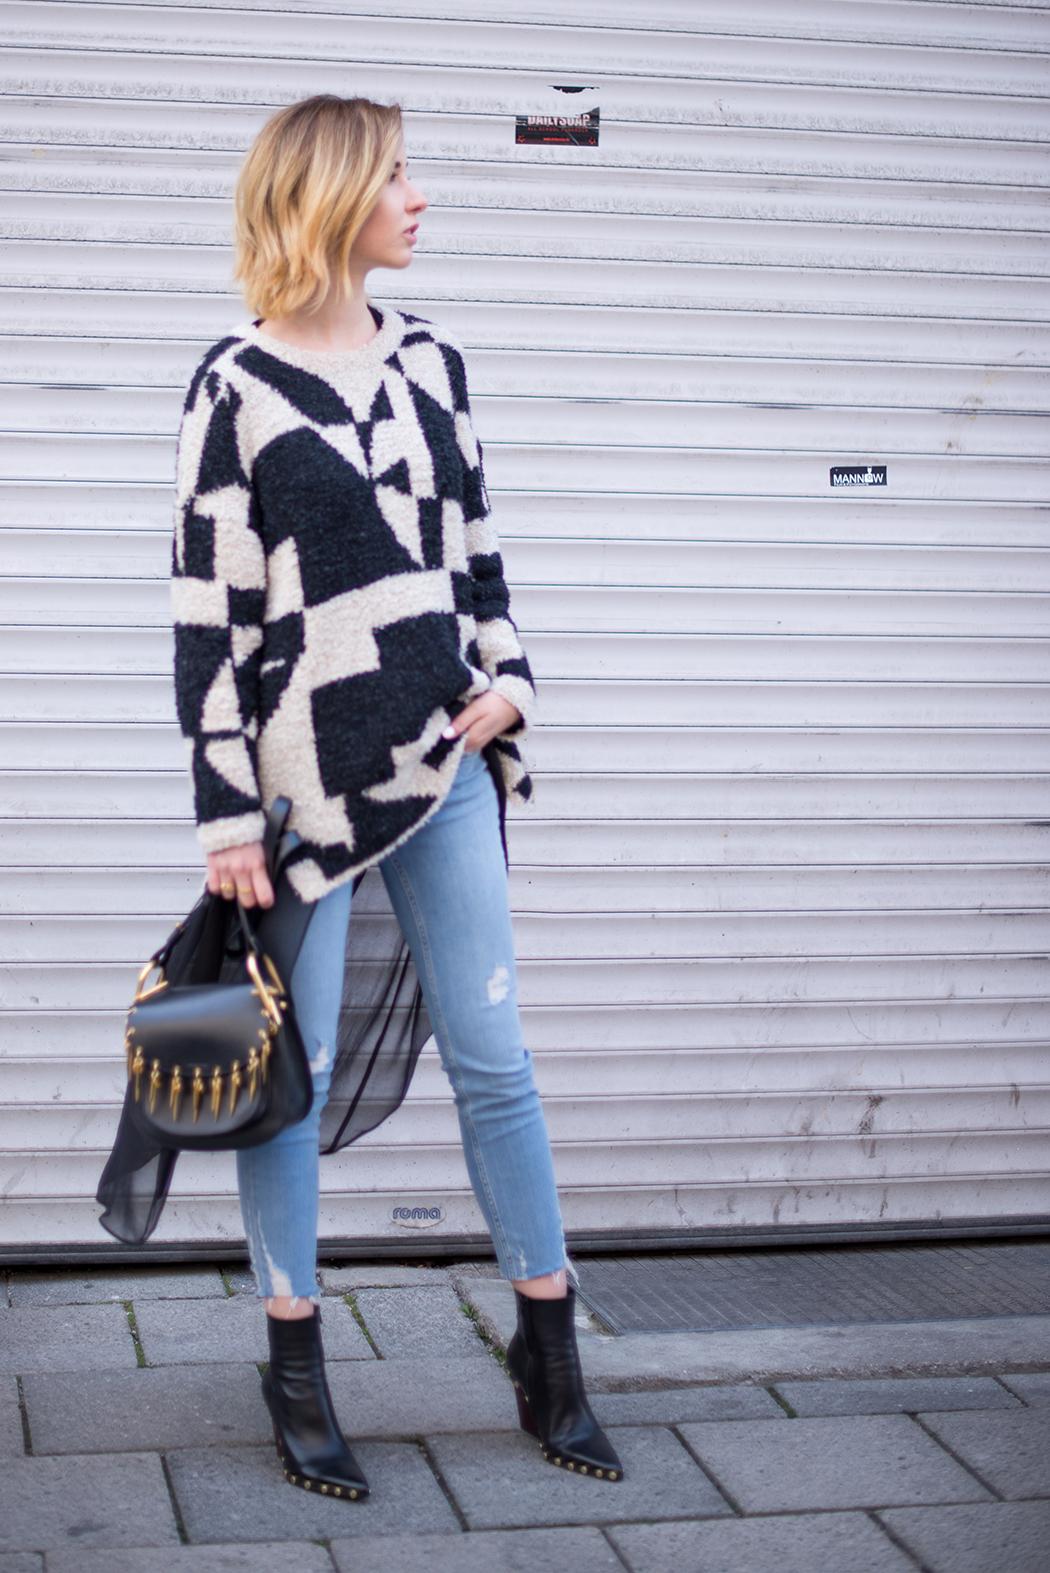 Fashionblog-Fashionblogger-Fashion-Blog-Blogger-Muenchen-Berlin-Celine-Rodeo-Boots-Booties-Celine-Stiefel-Ankleboots-Stiefeletten-SS16-_15